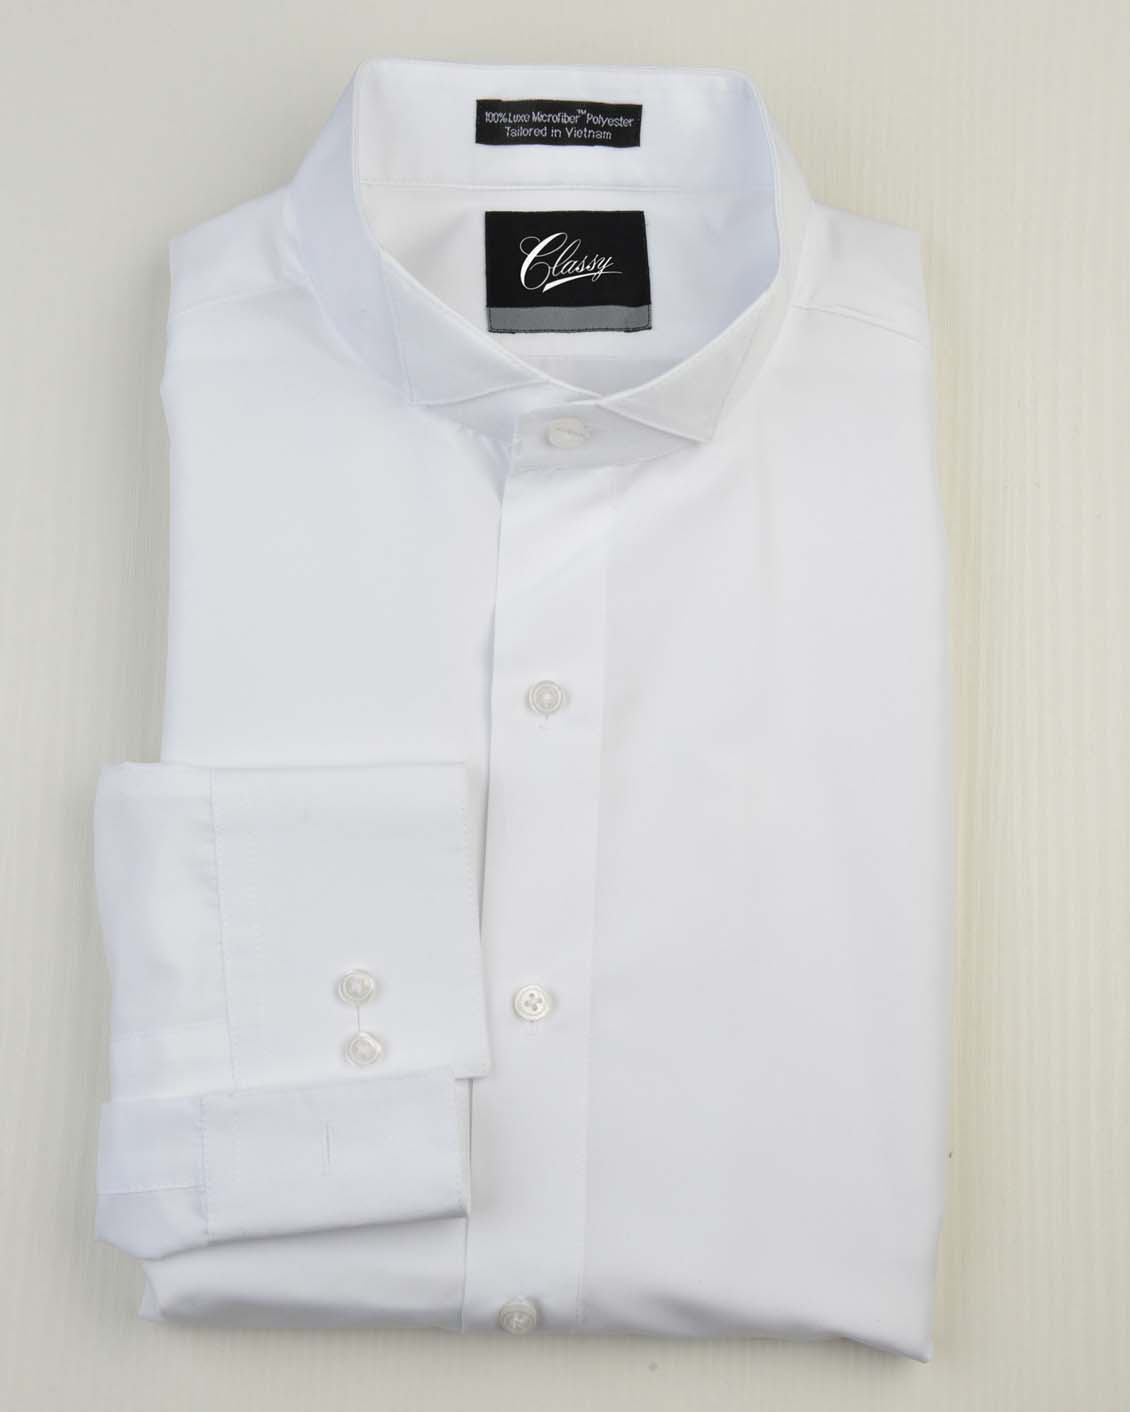 Tuxedo.ca - Microfiber Wing Tip Shirt